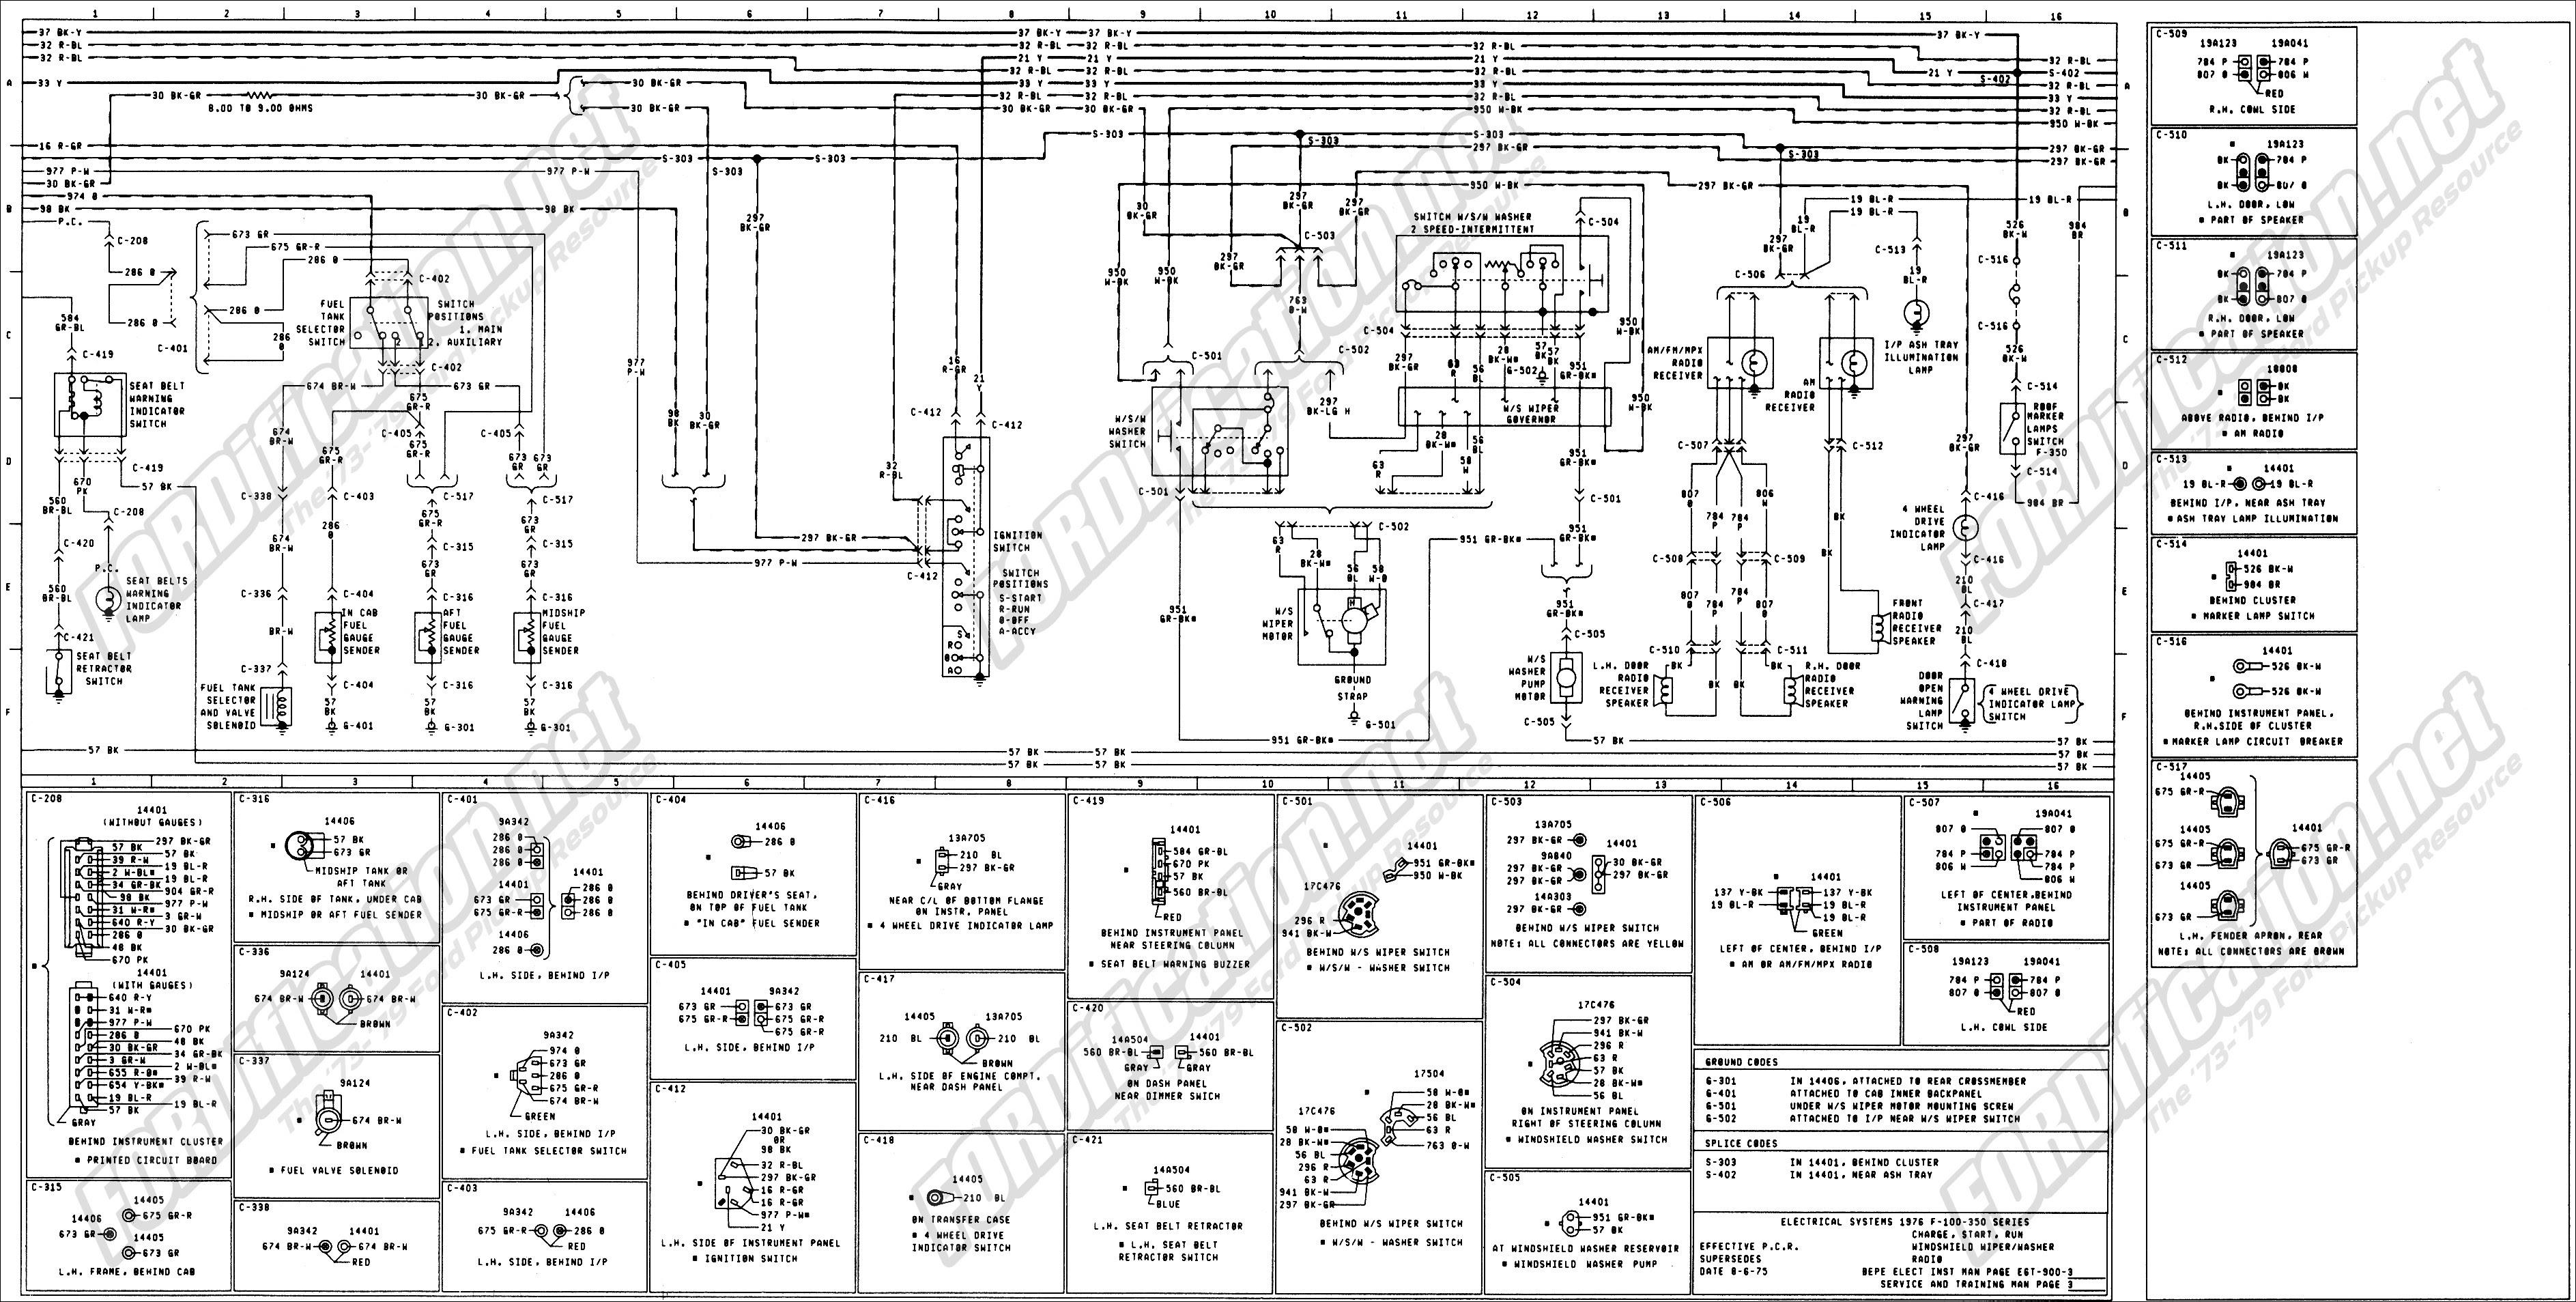 1979 Ford F150 Wiring Diagram - Hanenhuusholli